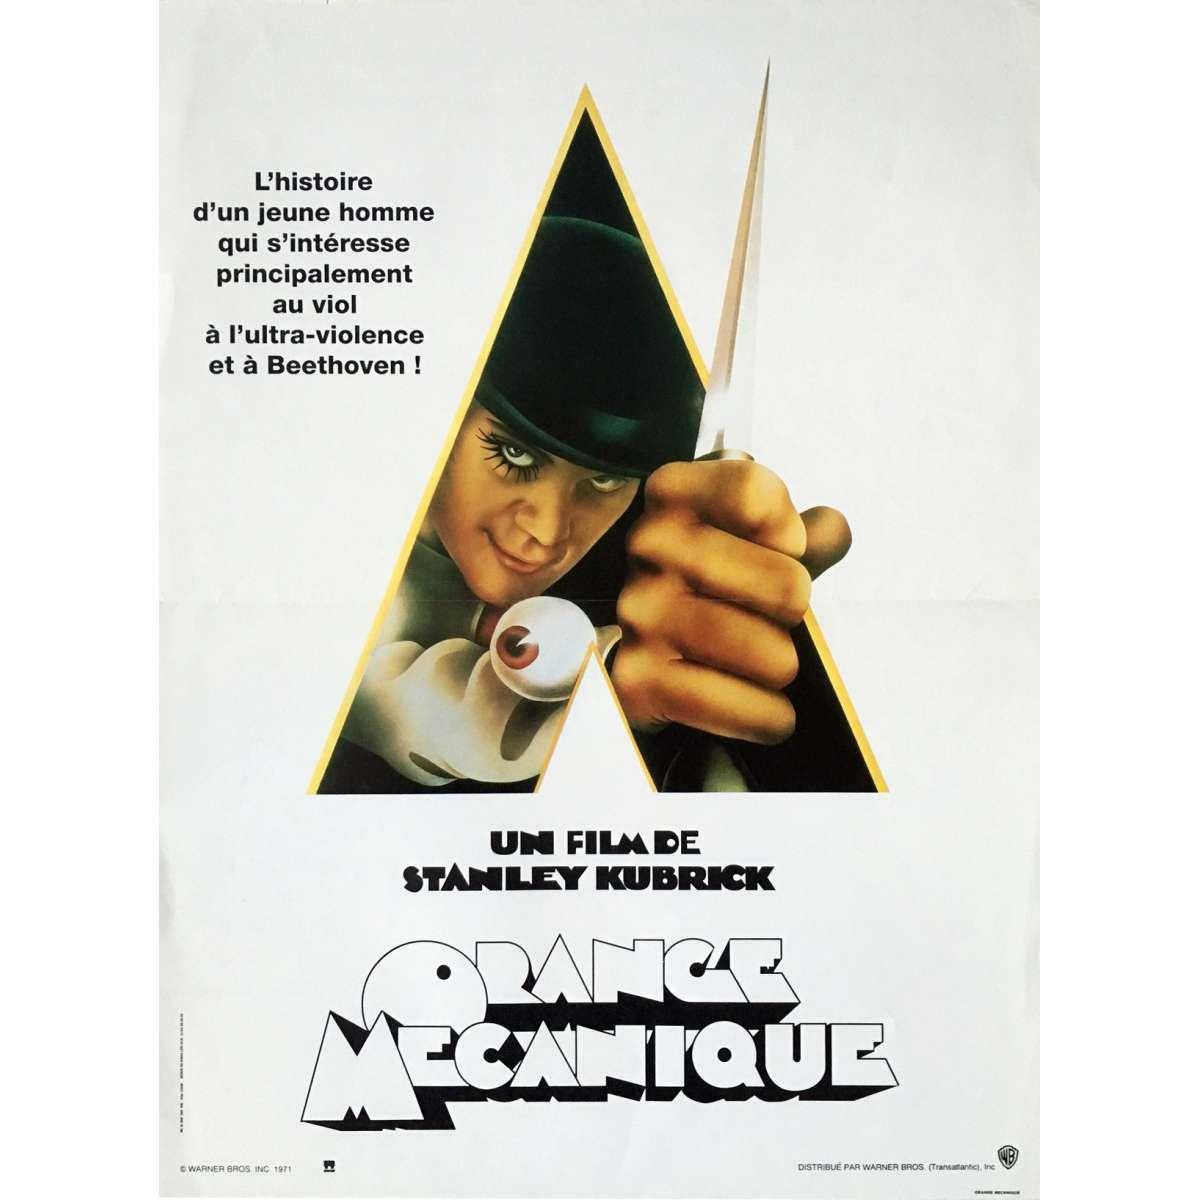 CLOCKWORK ORANGE Movie Poster A Clockwork Orange Movie Poster Original